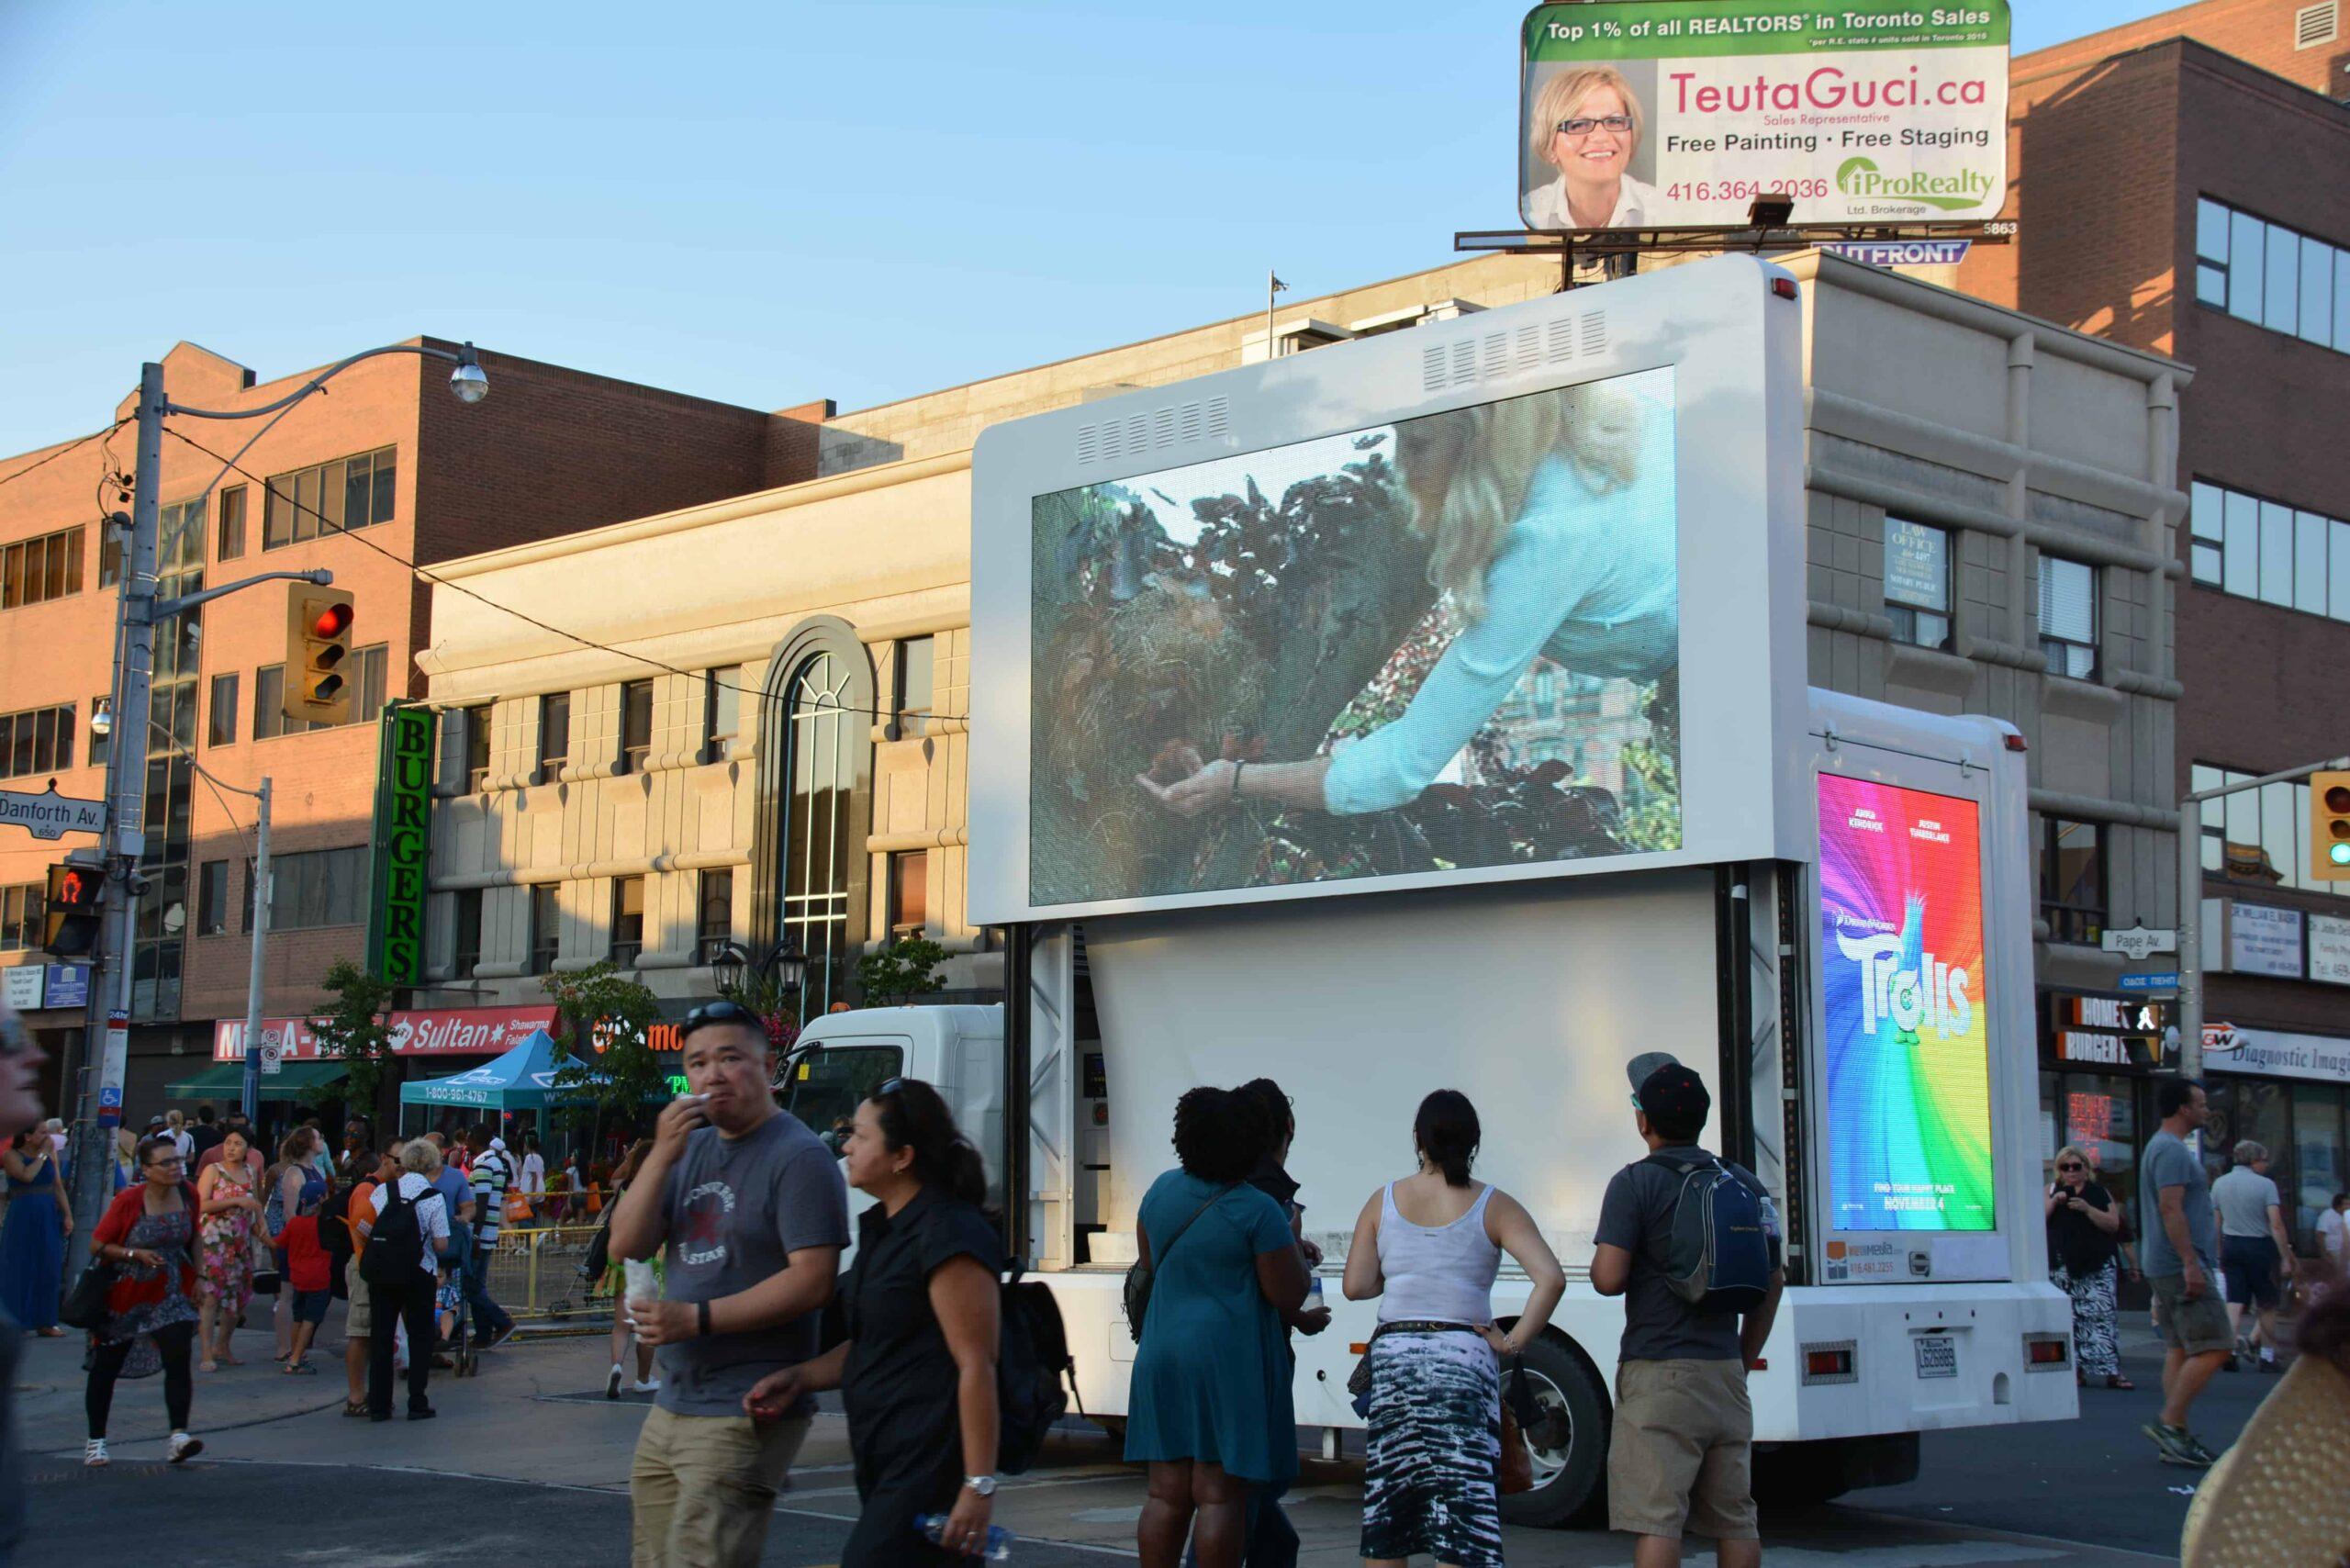 Top Billboard Advertising in Toronto Canada